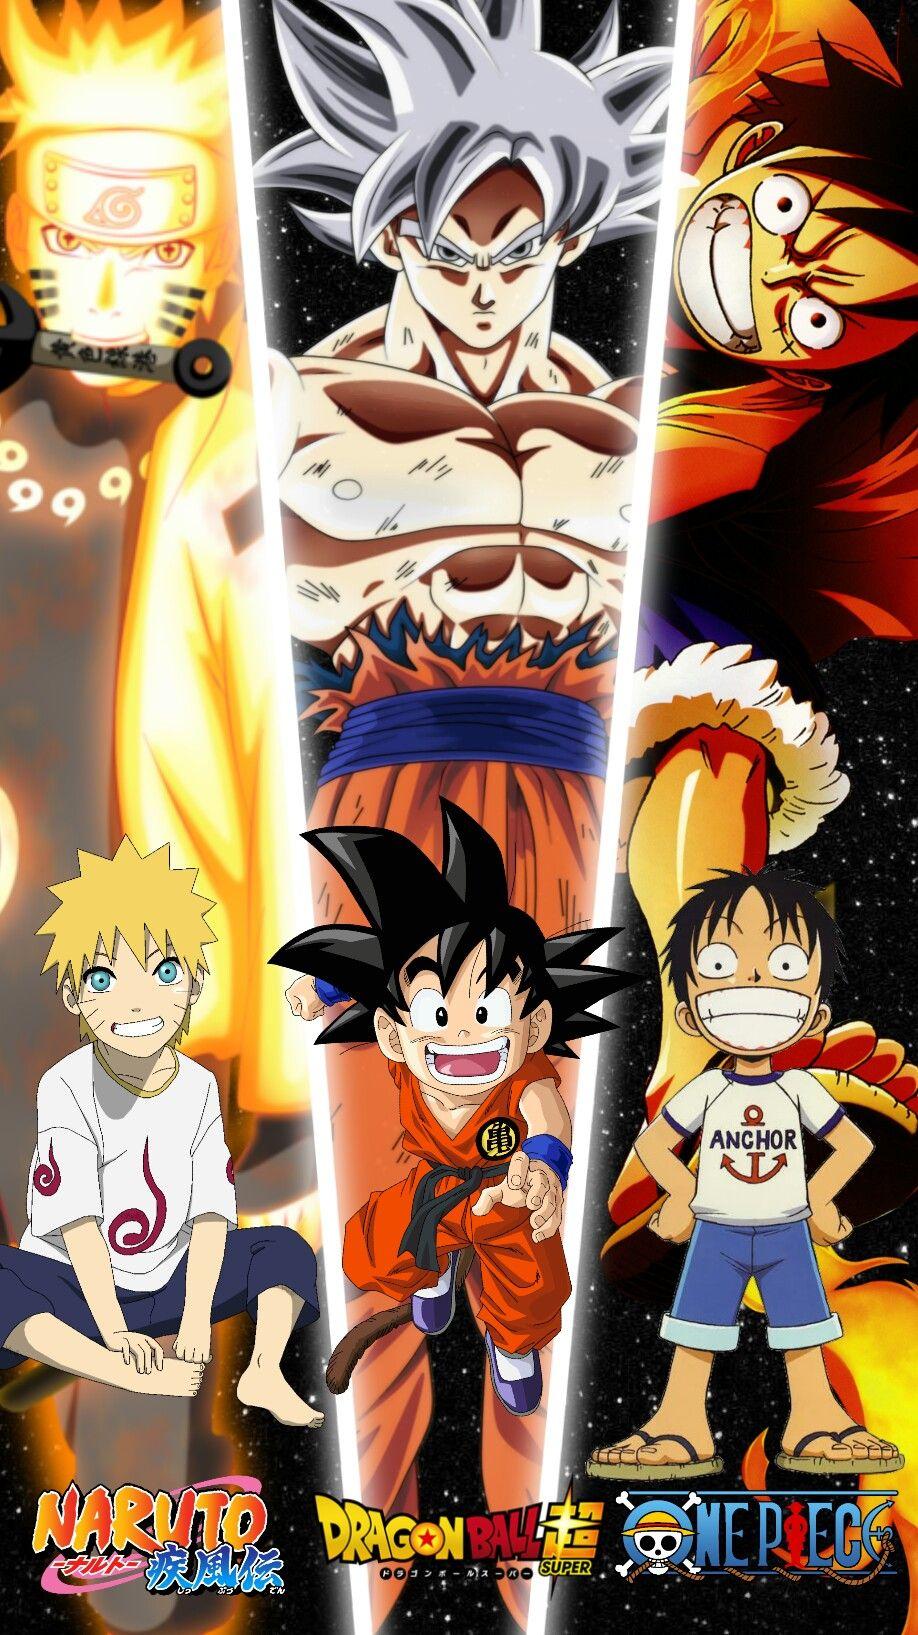 Goku in 9 art styles ! Naruto Goku Luffy Anime Dragon Ball Super Anime Dragon Ball Anime Crossover